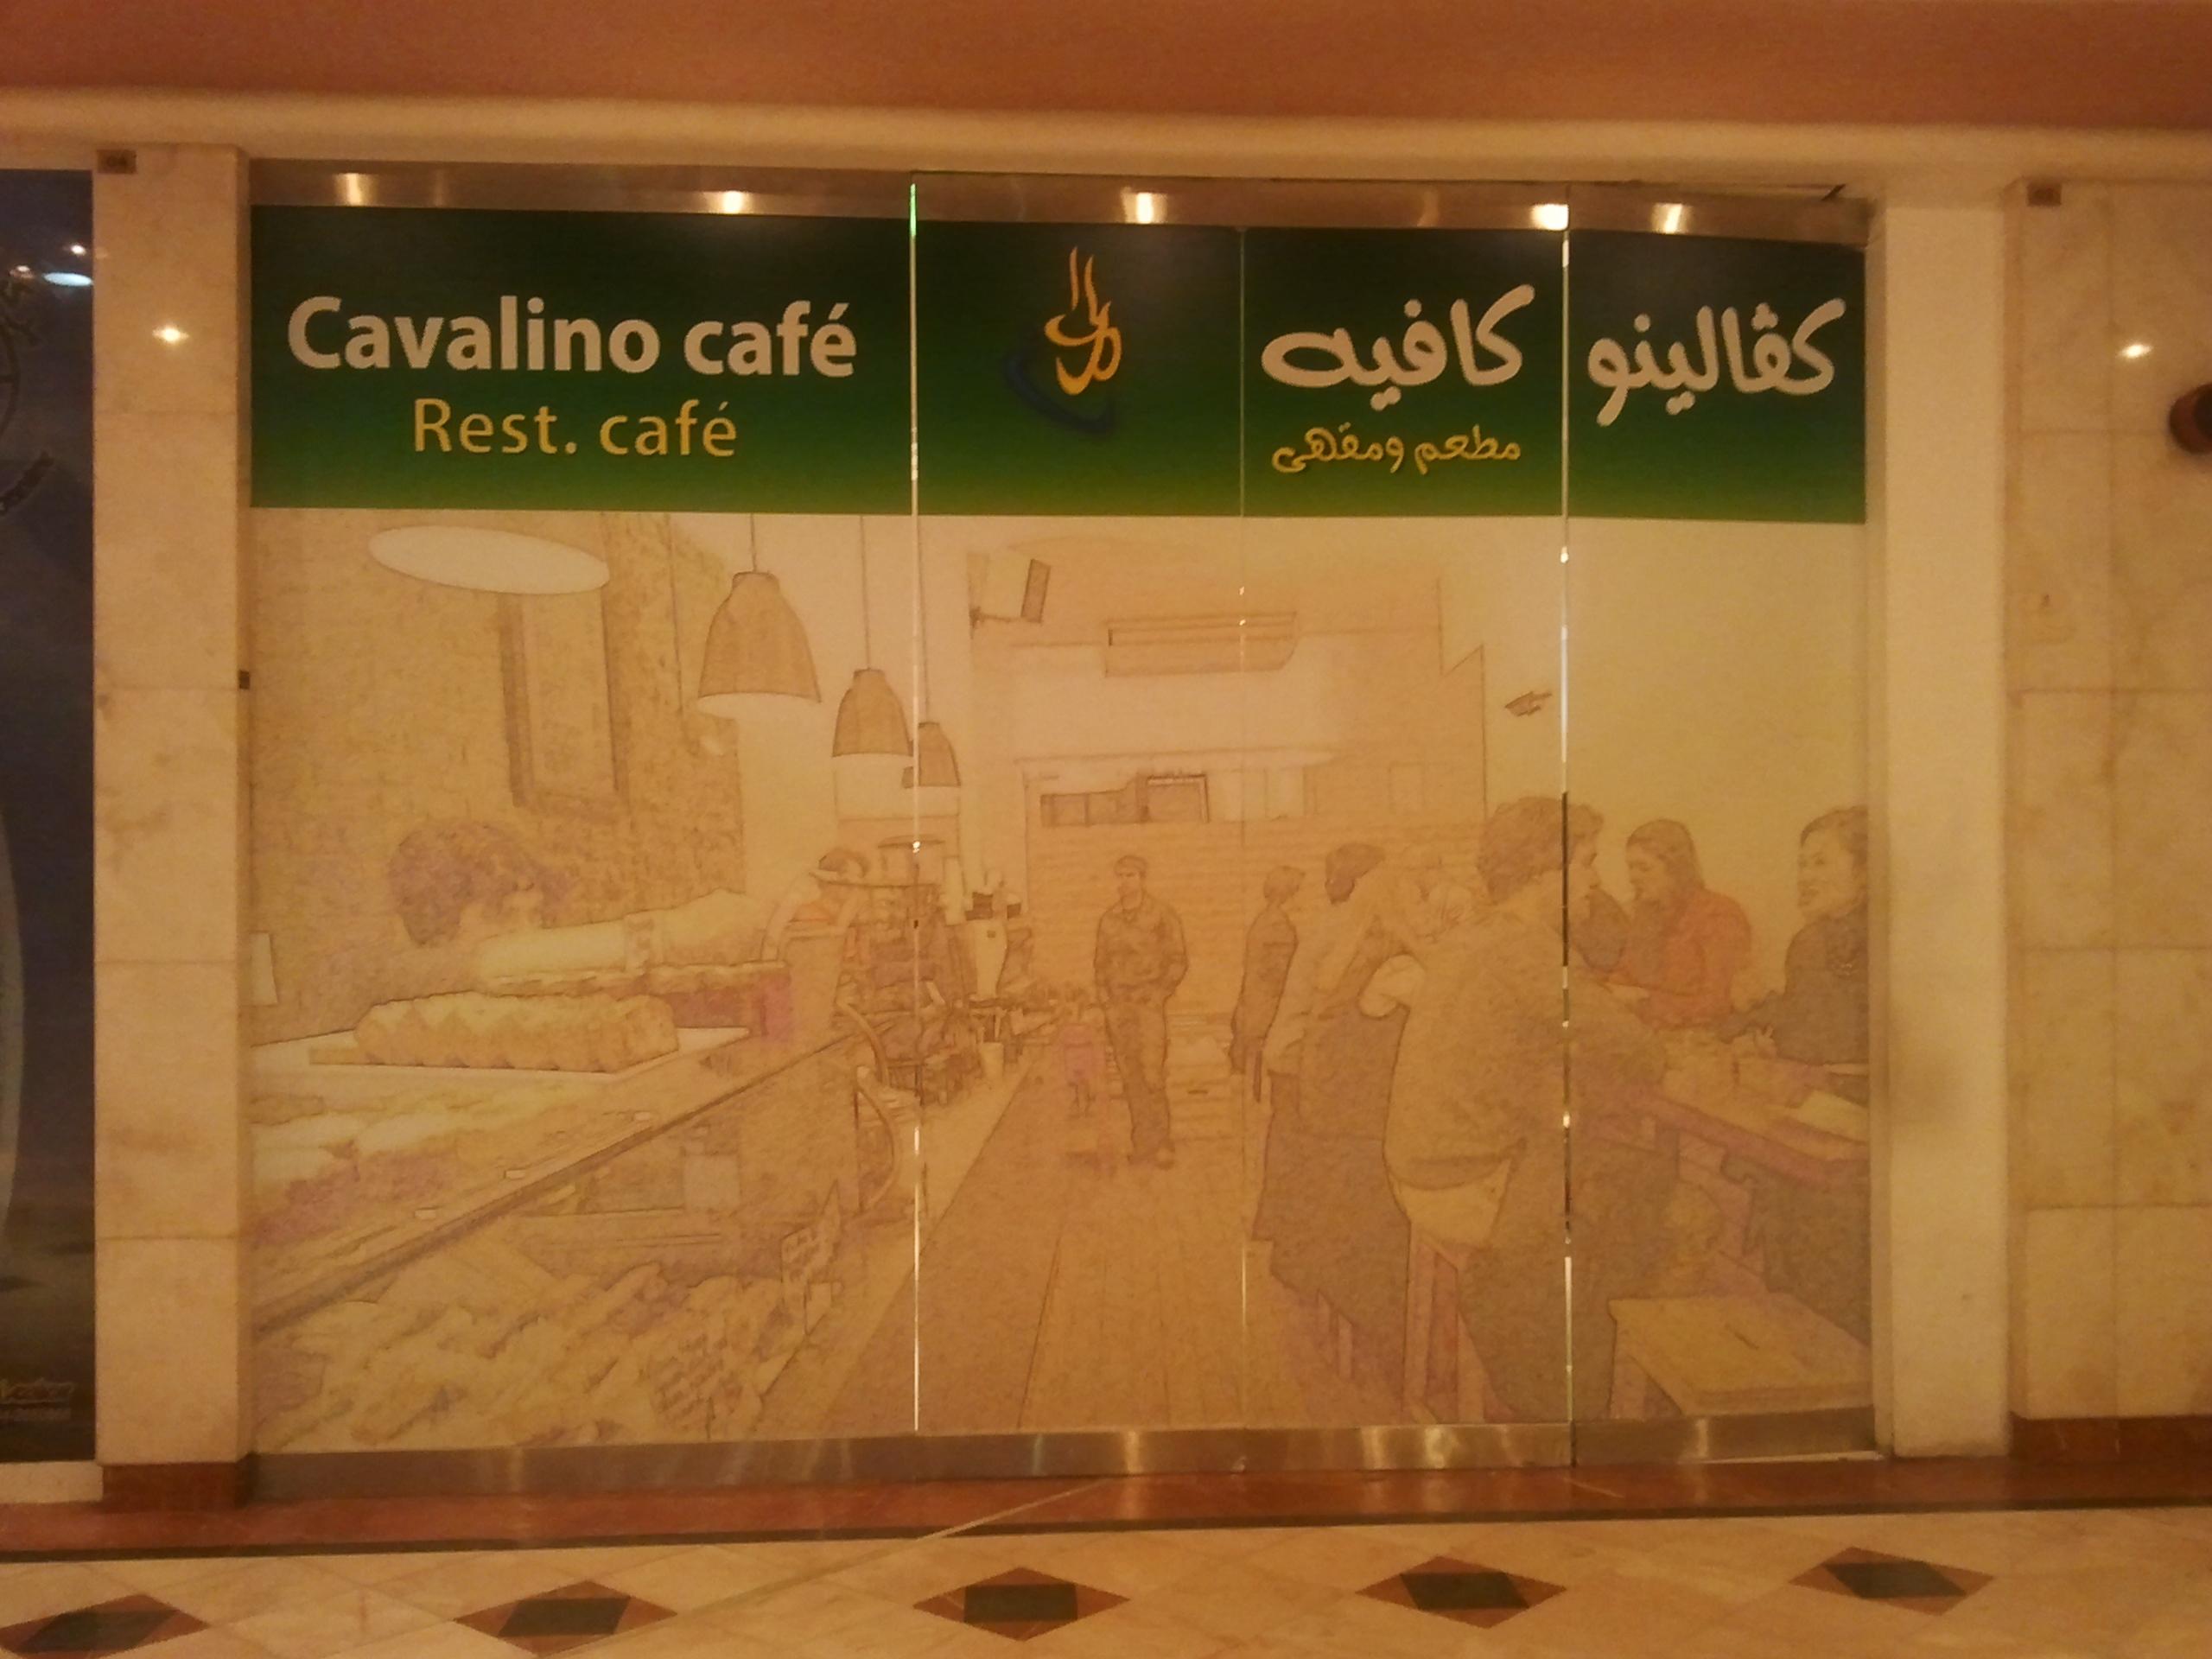 Cavalino Cafe